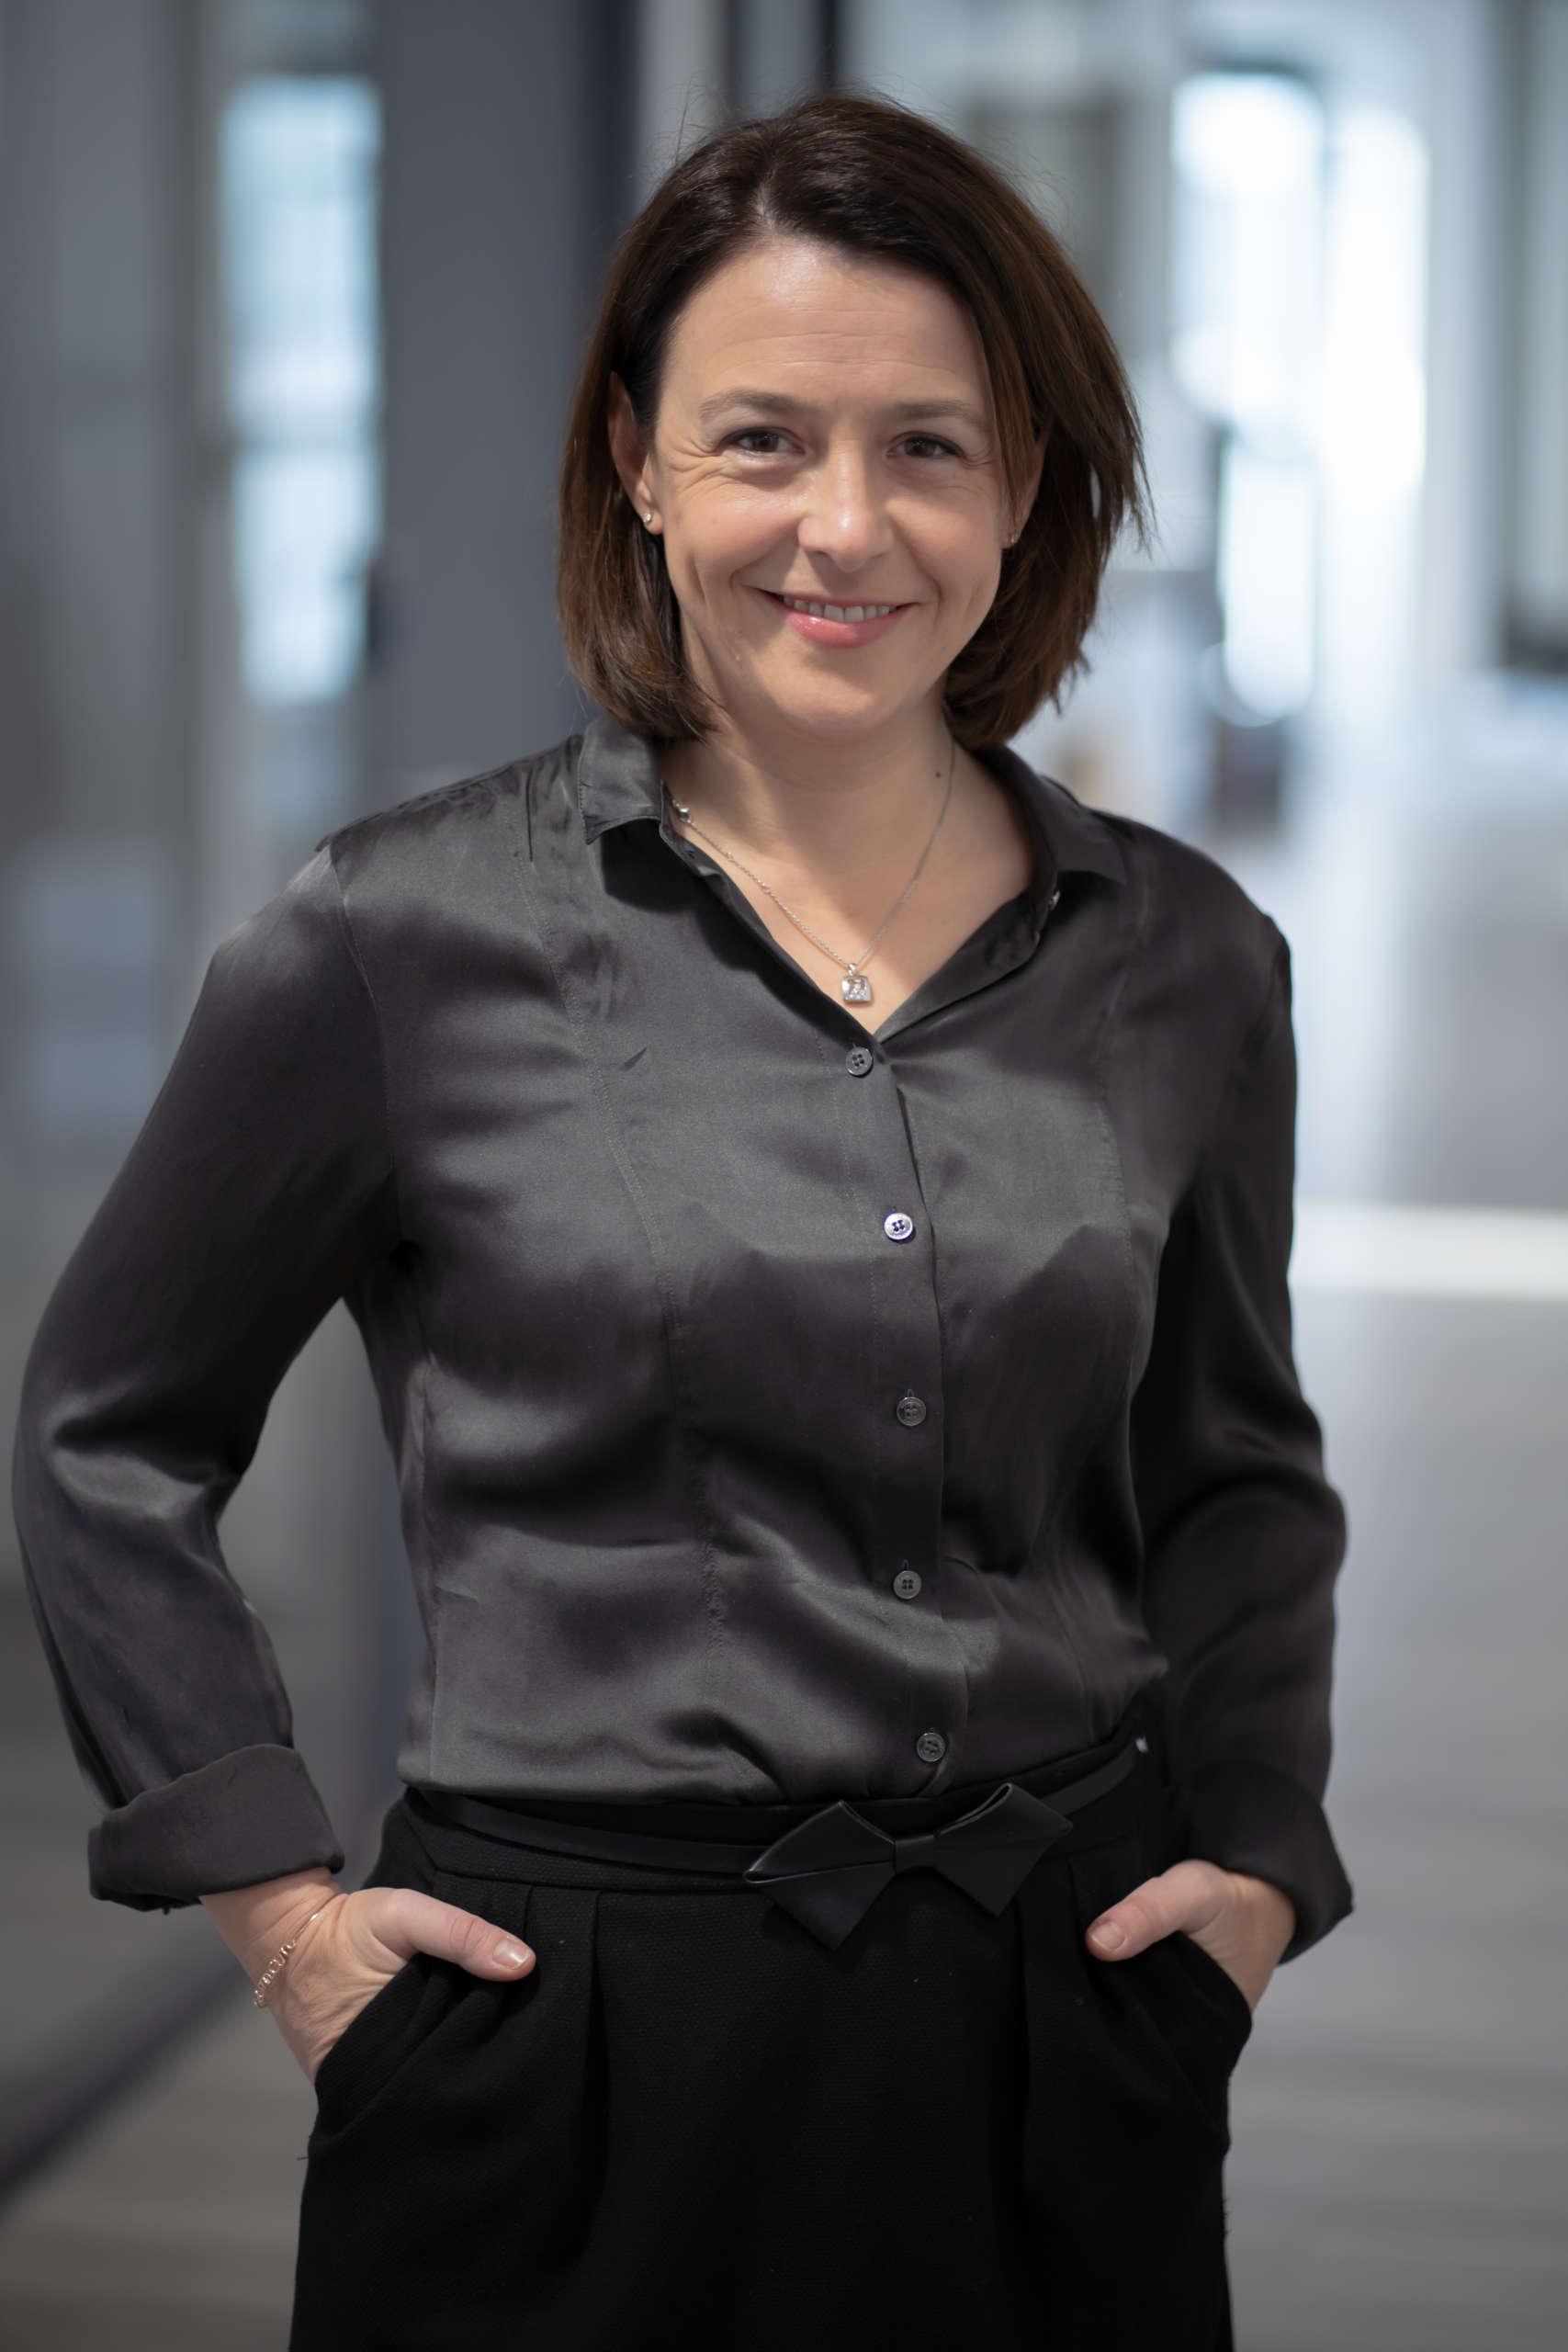 Stéphanie Perrod de Verdelhan